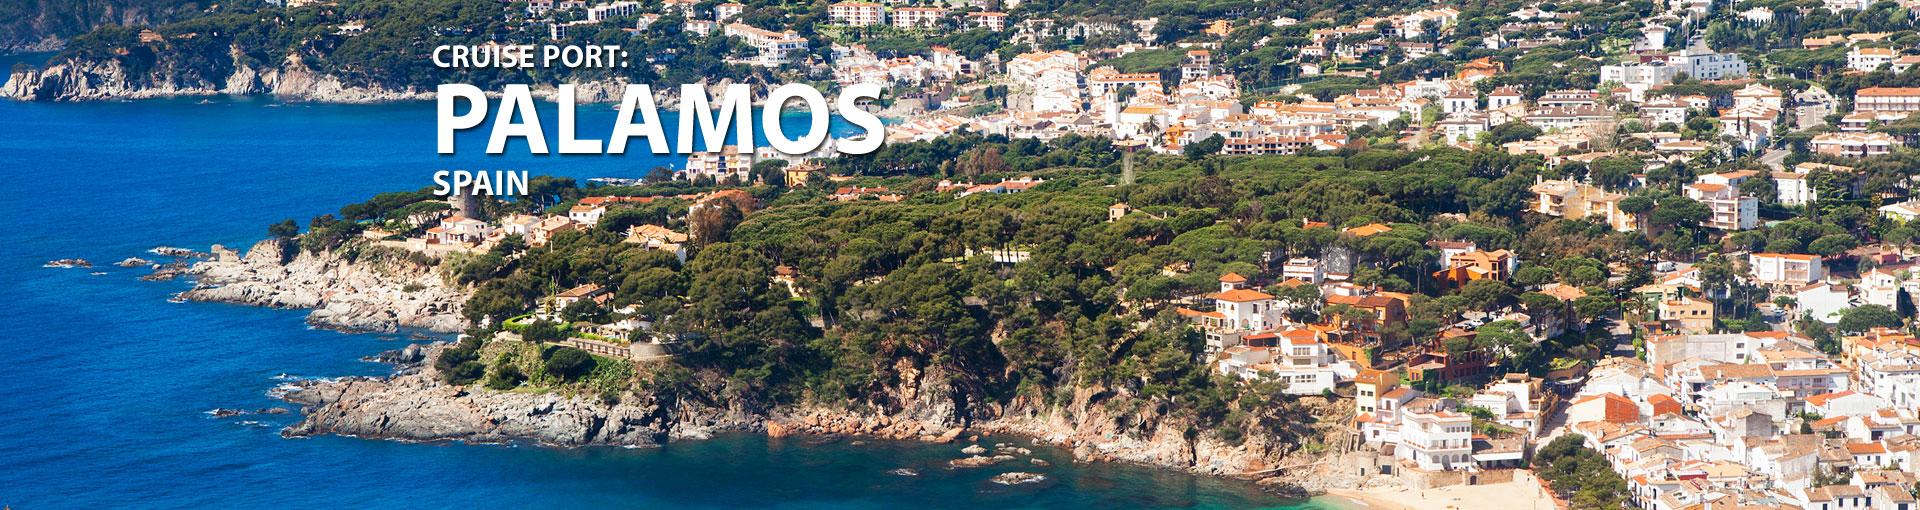 Cruises to Palamos, Spain